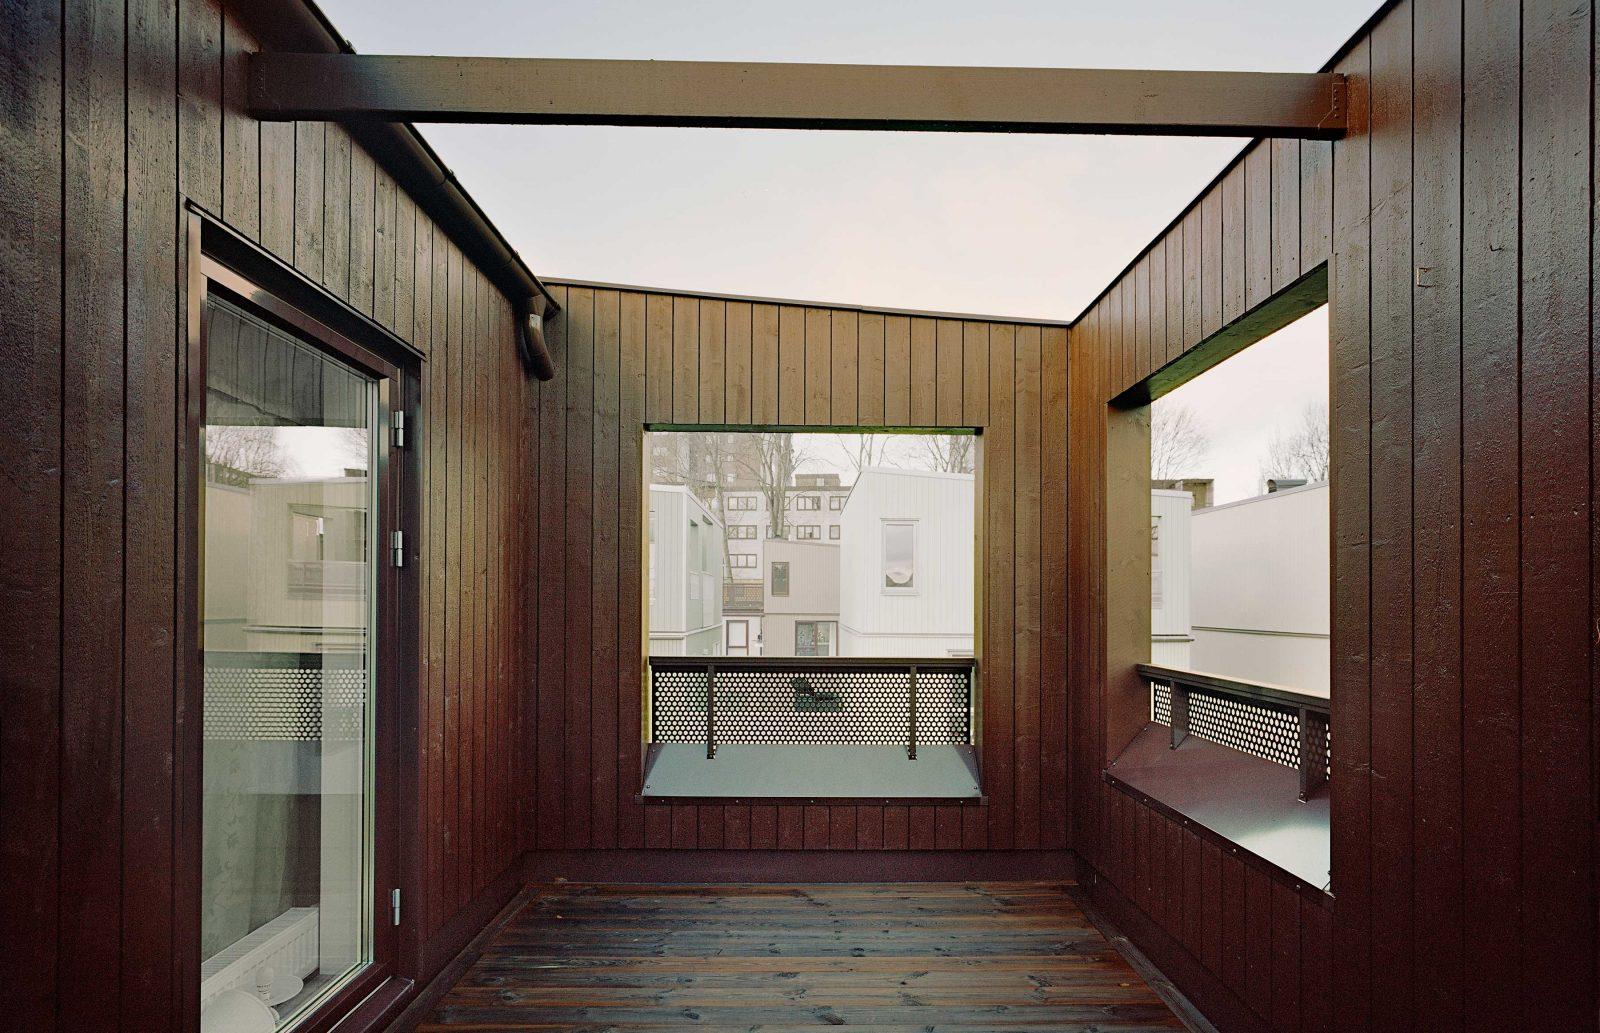 KjellanderSjoberg Fittja Terrace roof-terrace